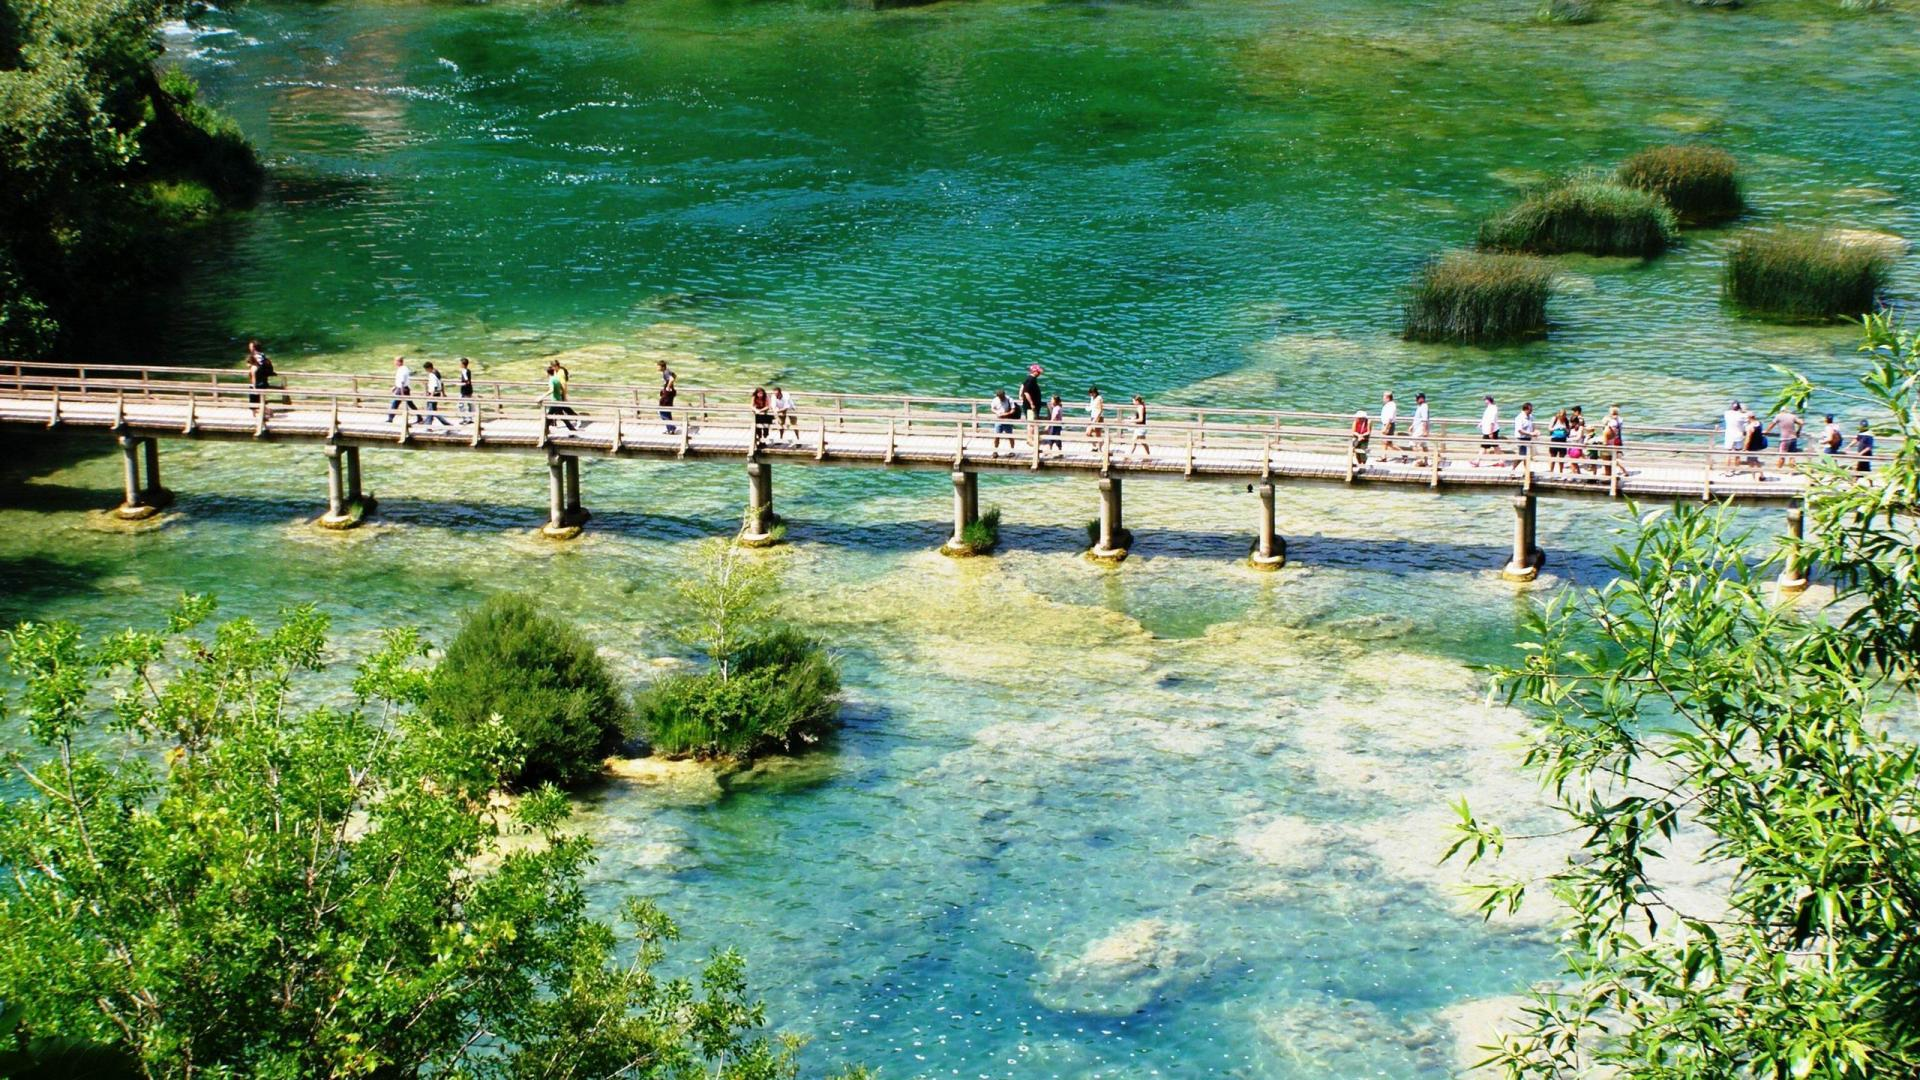 Hrvatska - Page 9 Nature-landscapes_hdwallpaper_bridge-at-krka-national-park-croatia_24782